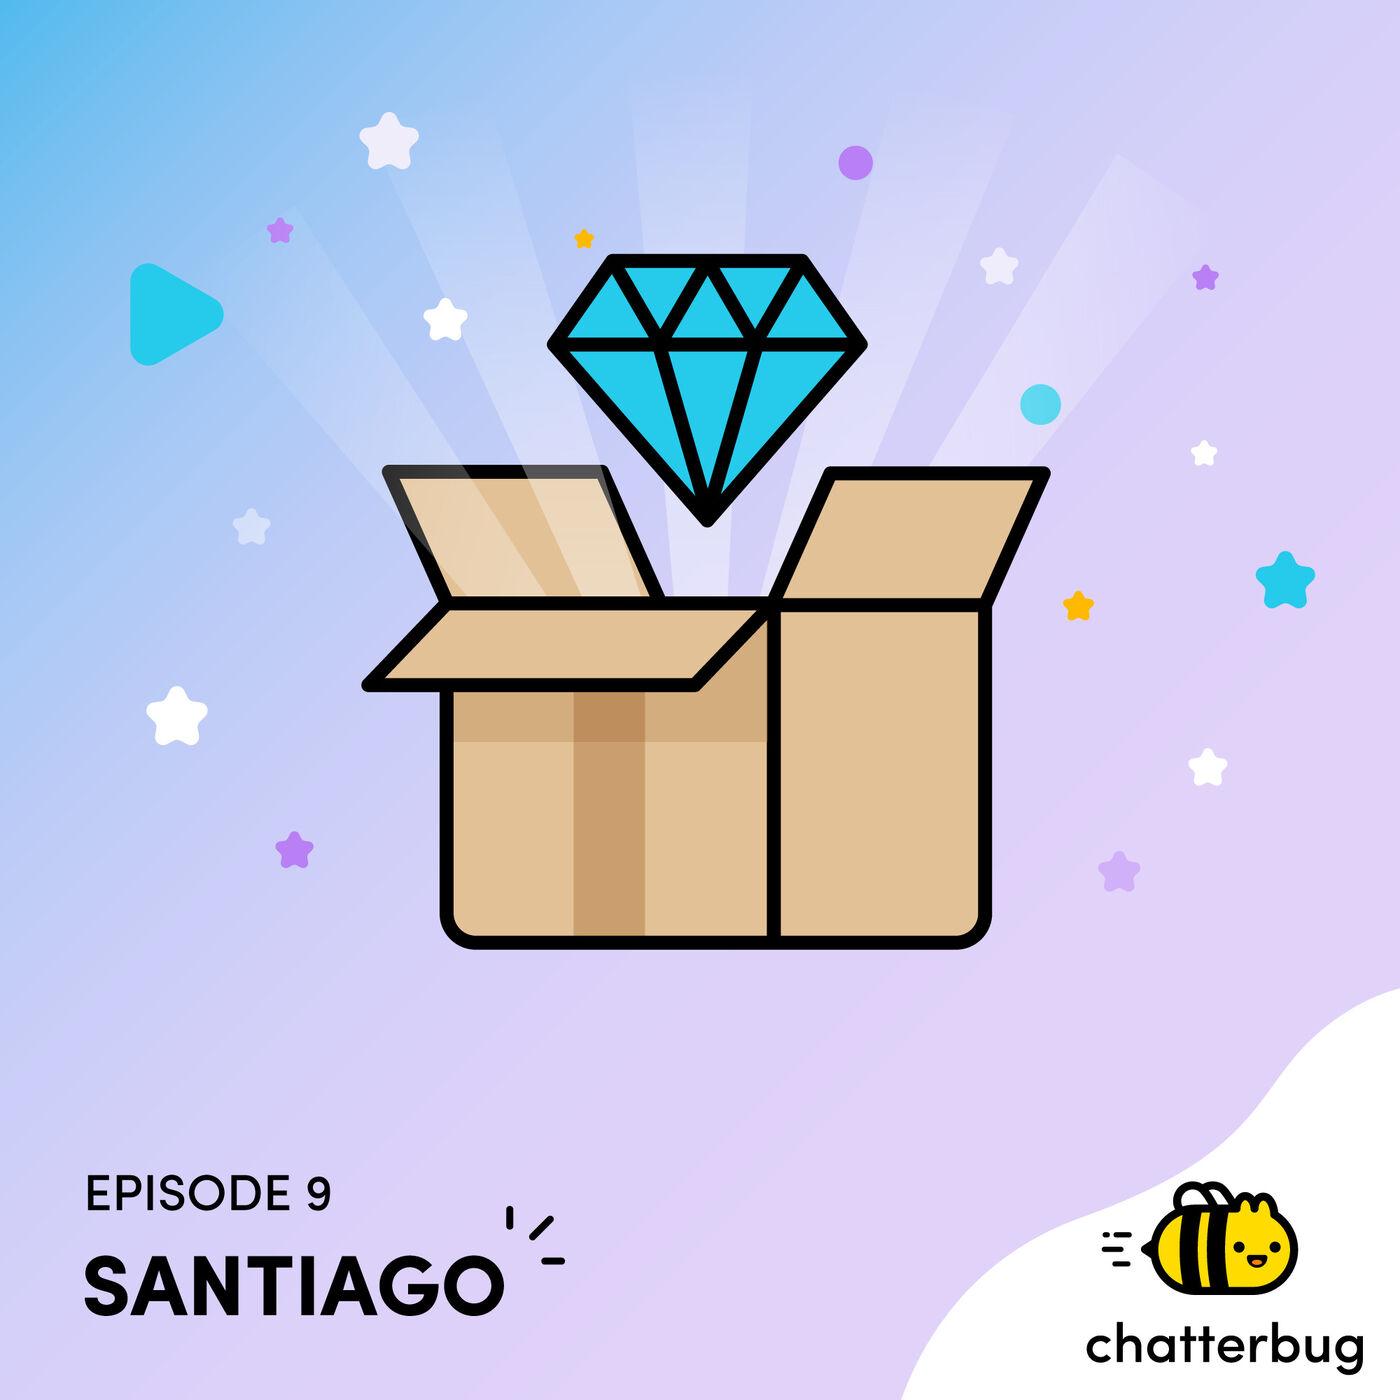 Episode 9 - Santiago